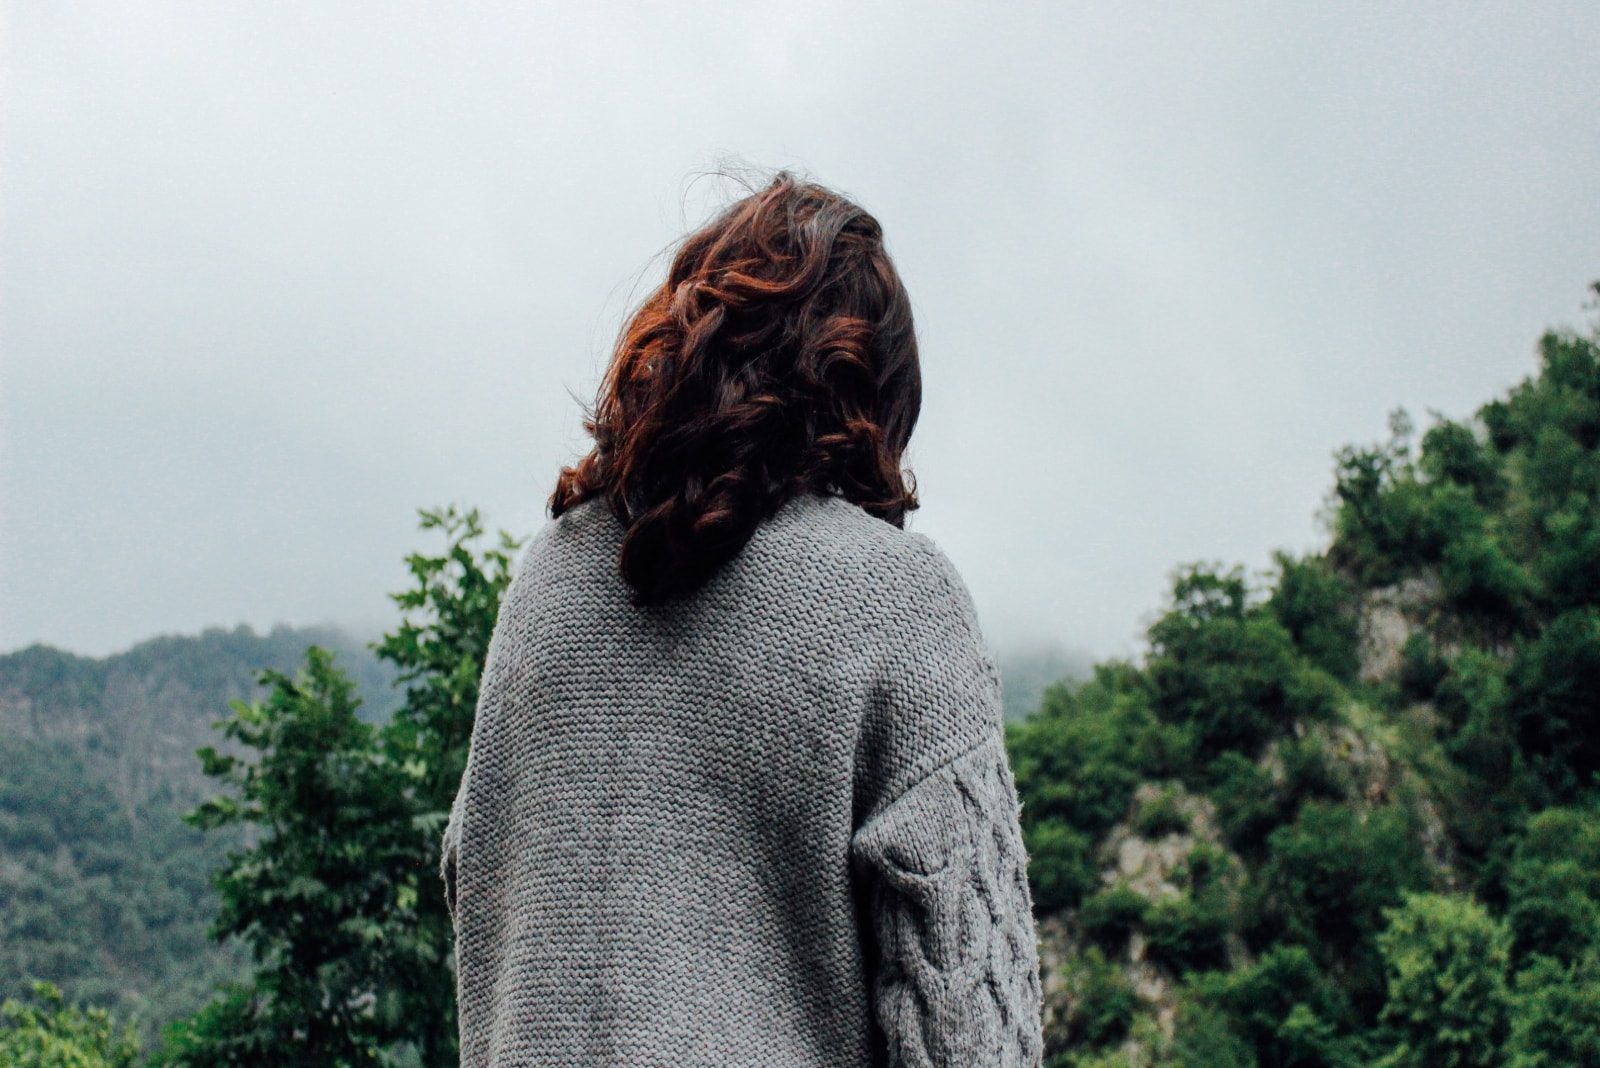 woman in gray sweater standing near tree